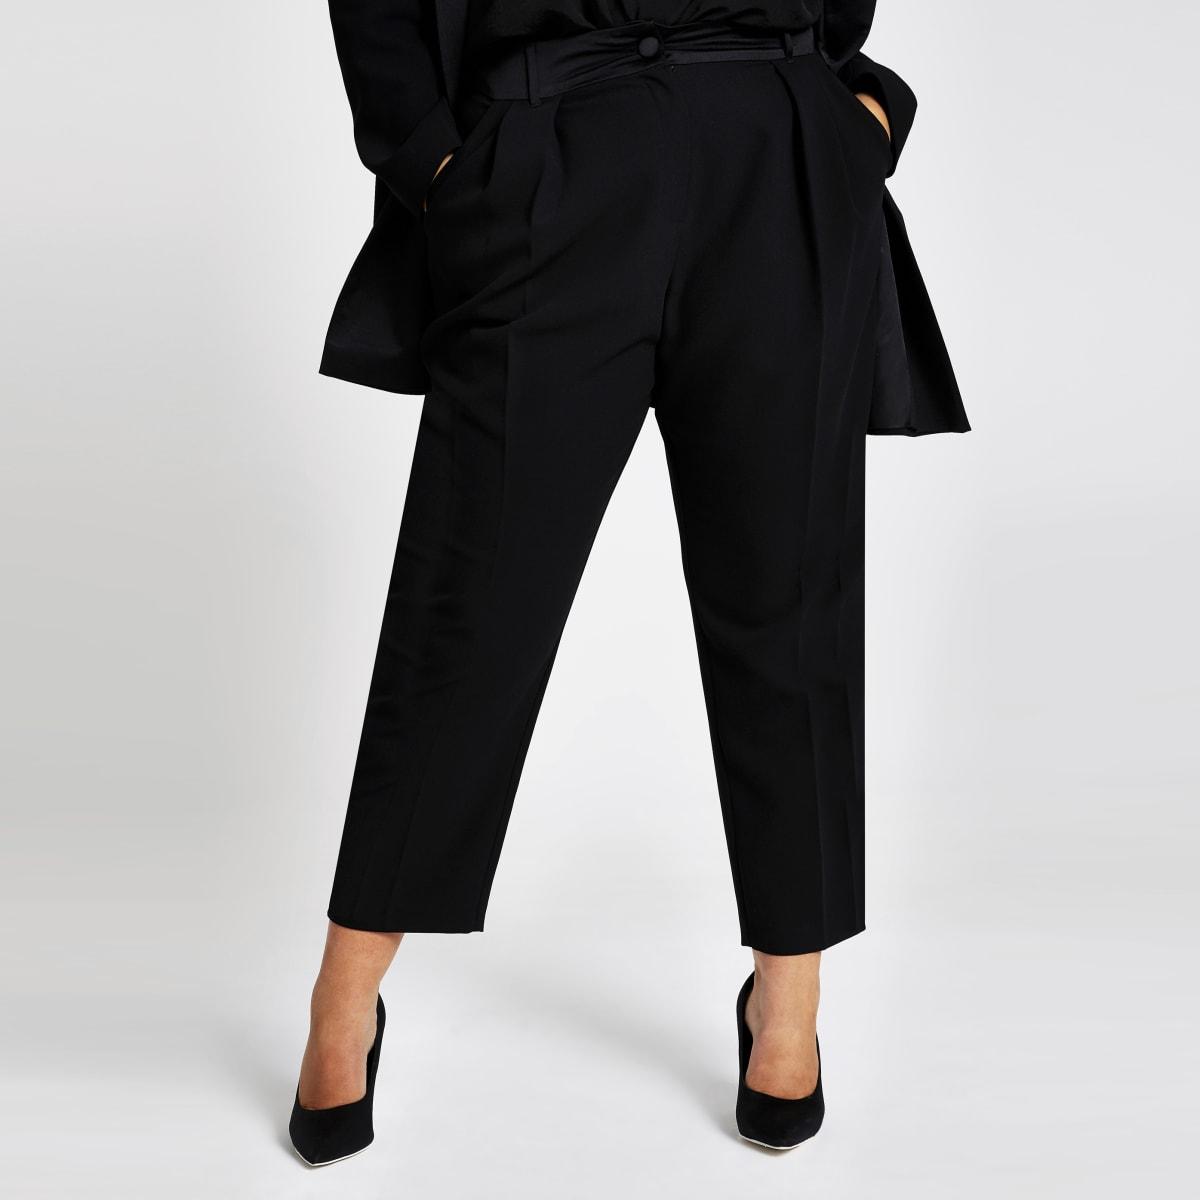 Plus black tux high waisted peg trousers